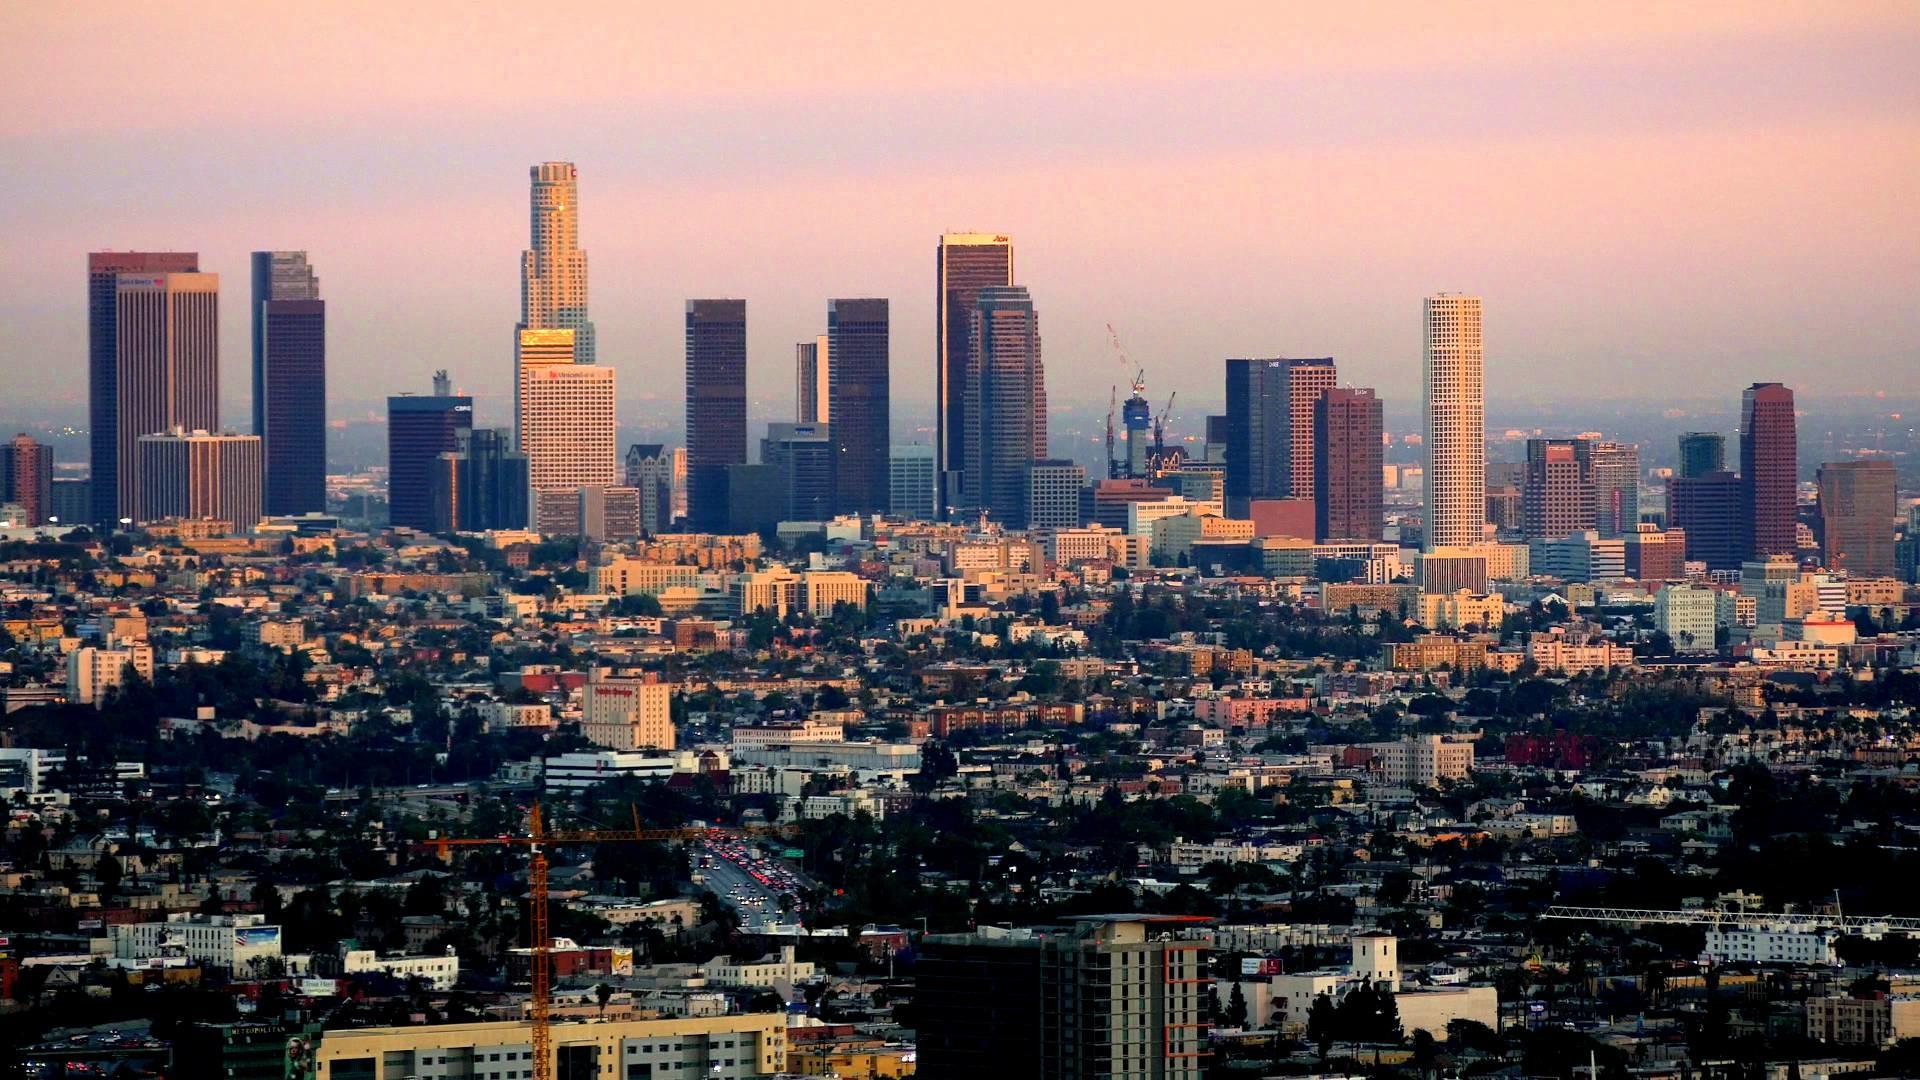 Los Angeles, California, USA, viewed from Mulholland Drive at dusk, 4K